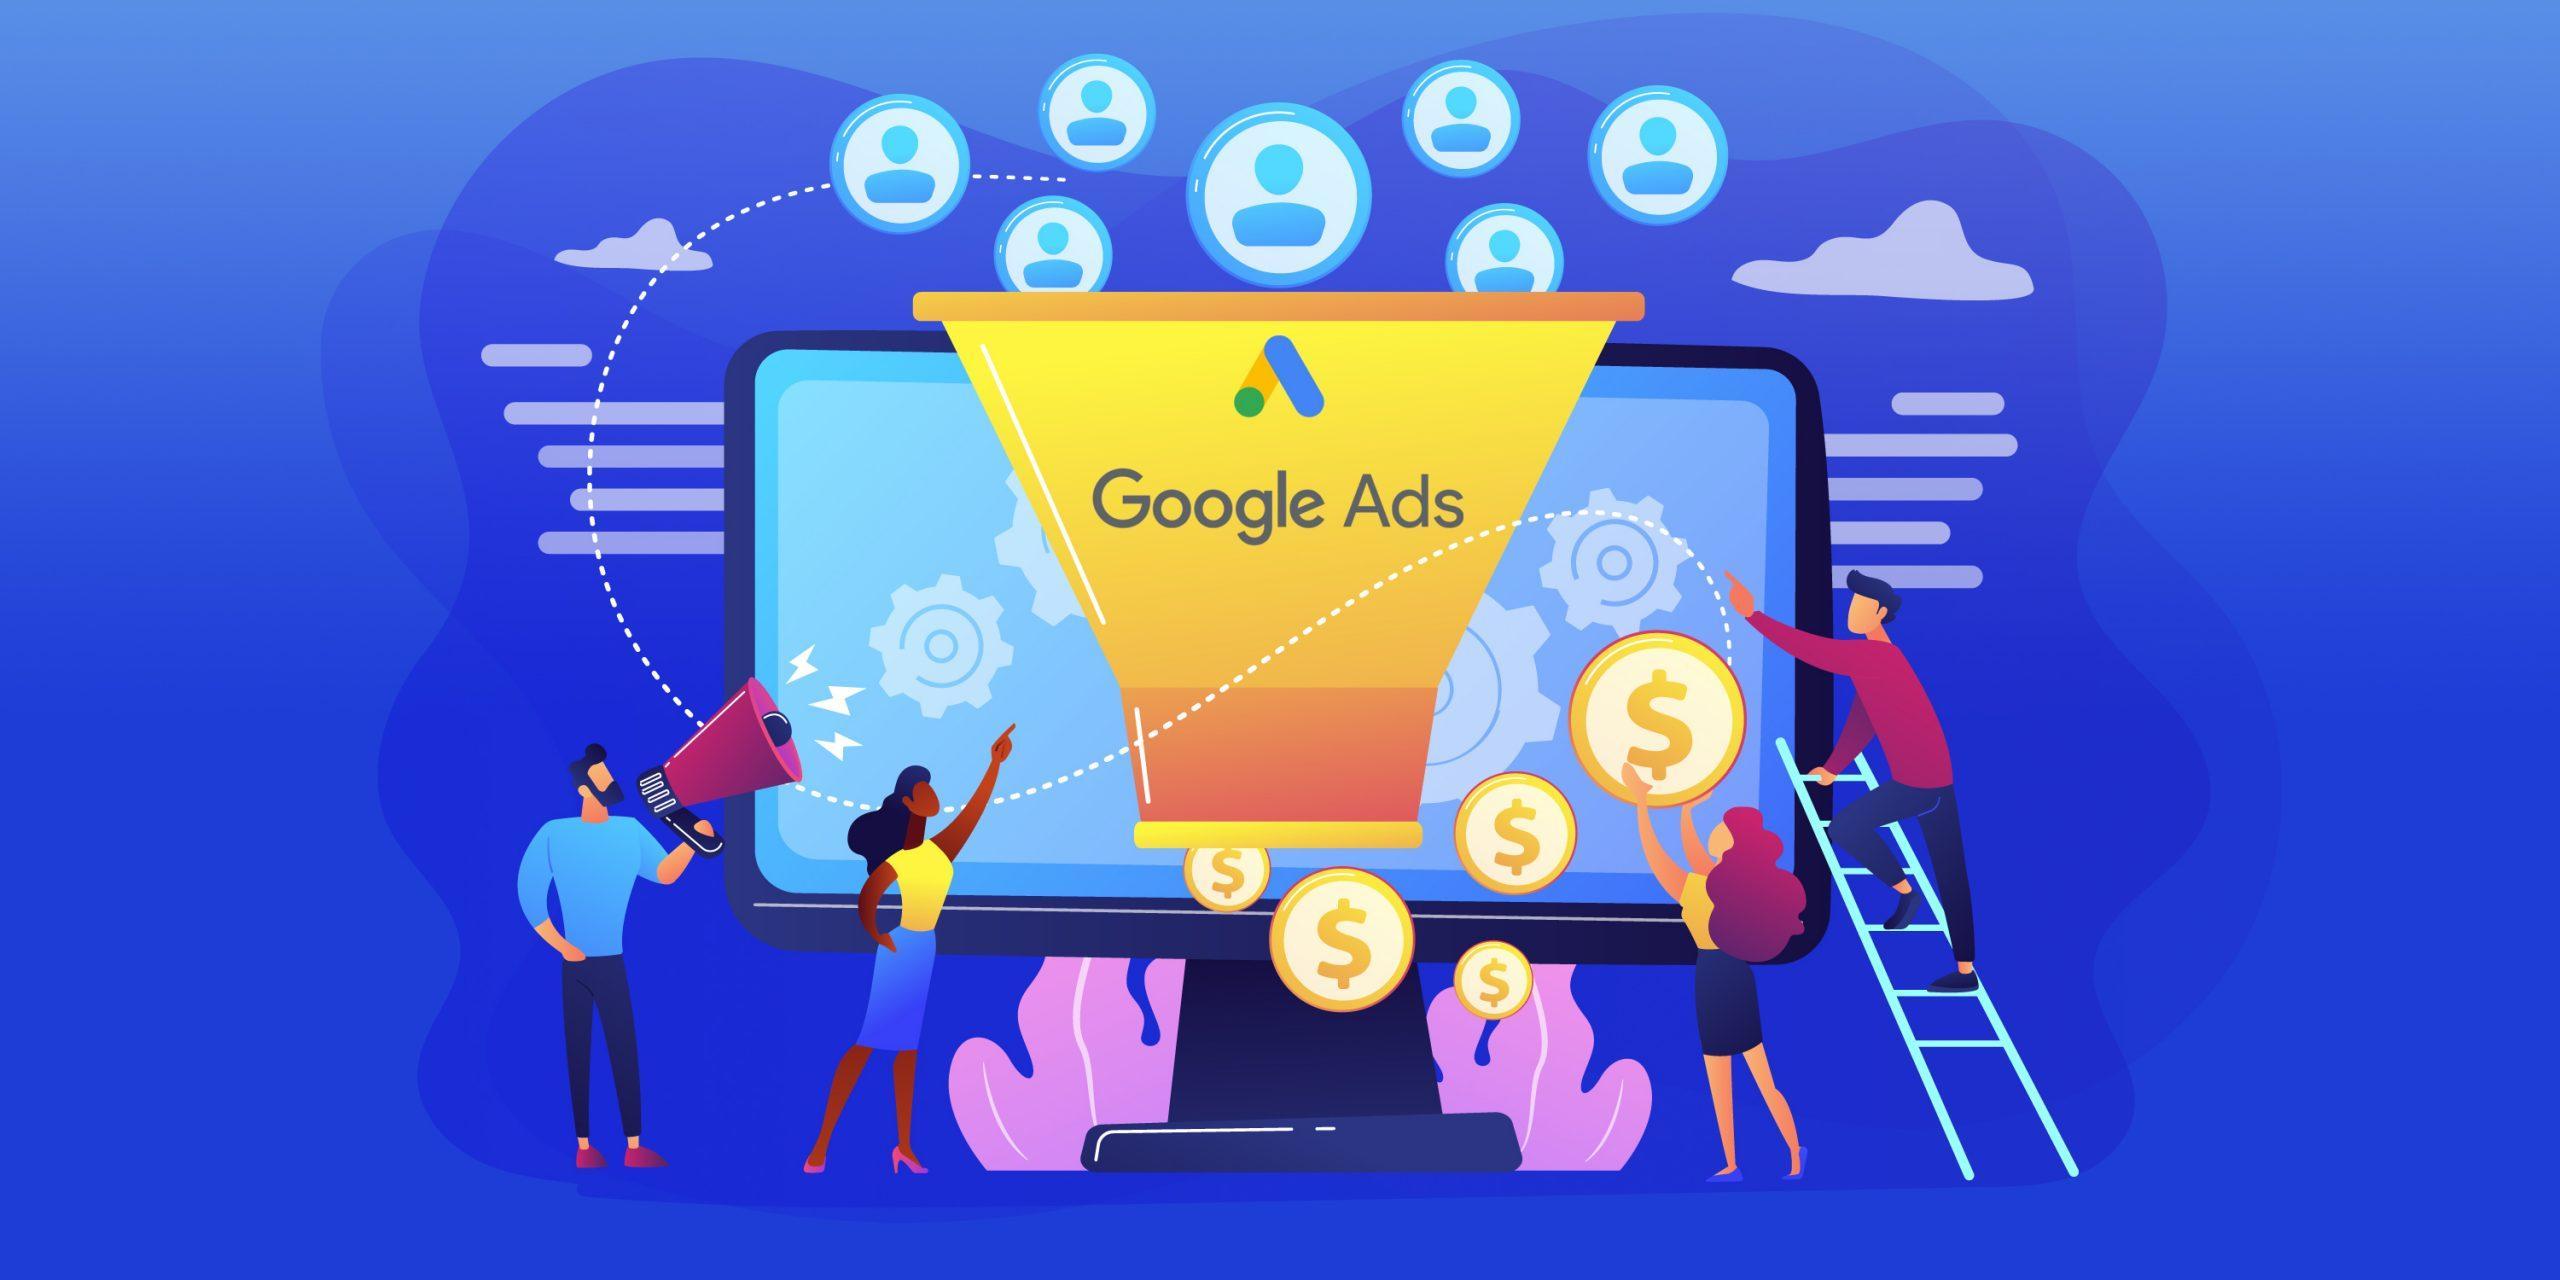 {:en}Ads on Google Ads don't generate leads. We fix the situation together!{:}{:ru}Реклама в Google Ads не приносит лиды. Исправляем ситуацию вместе! {:}